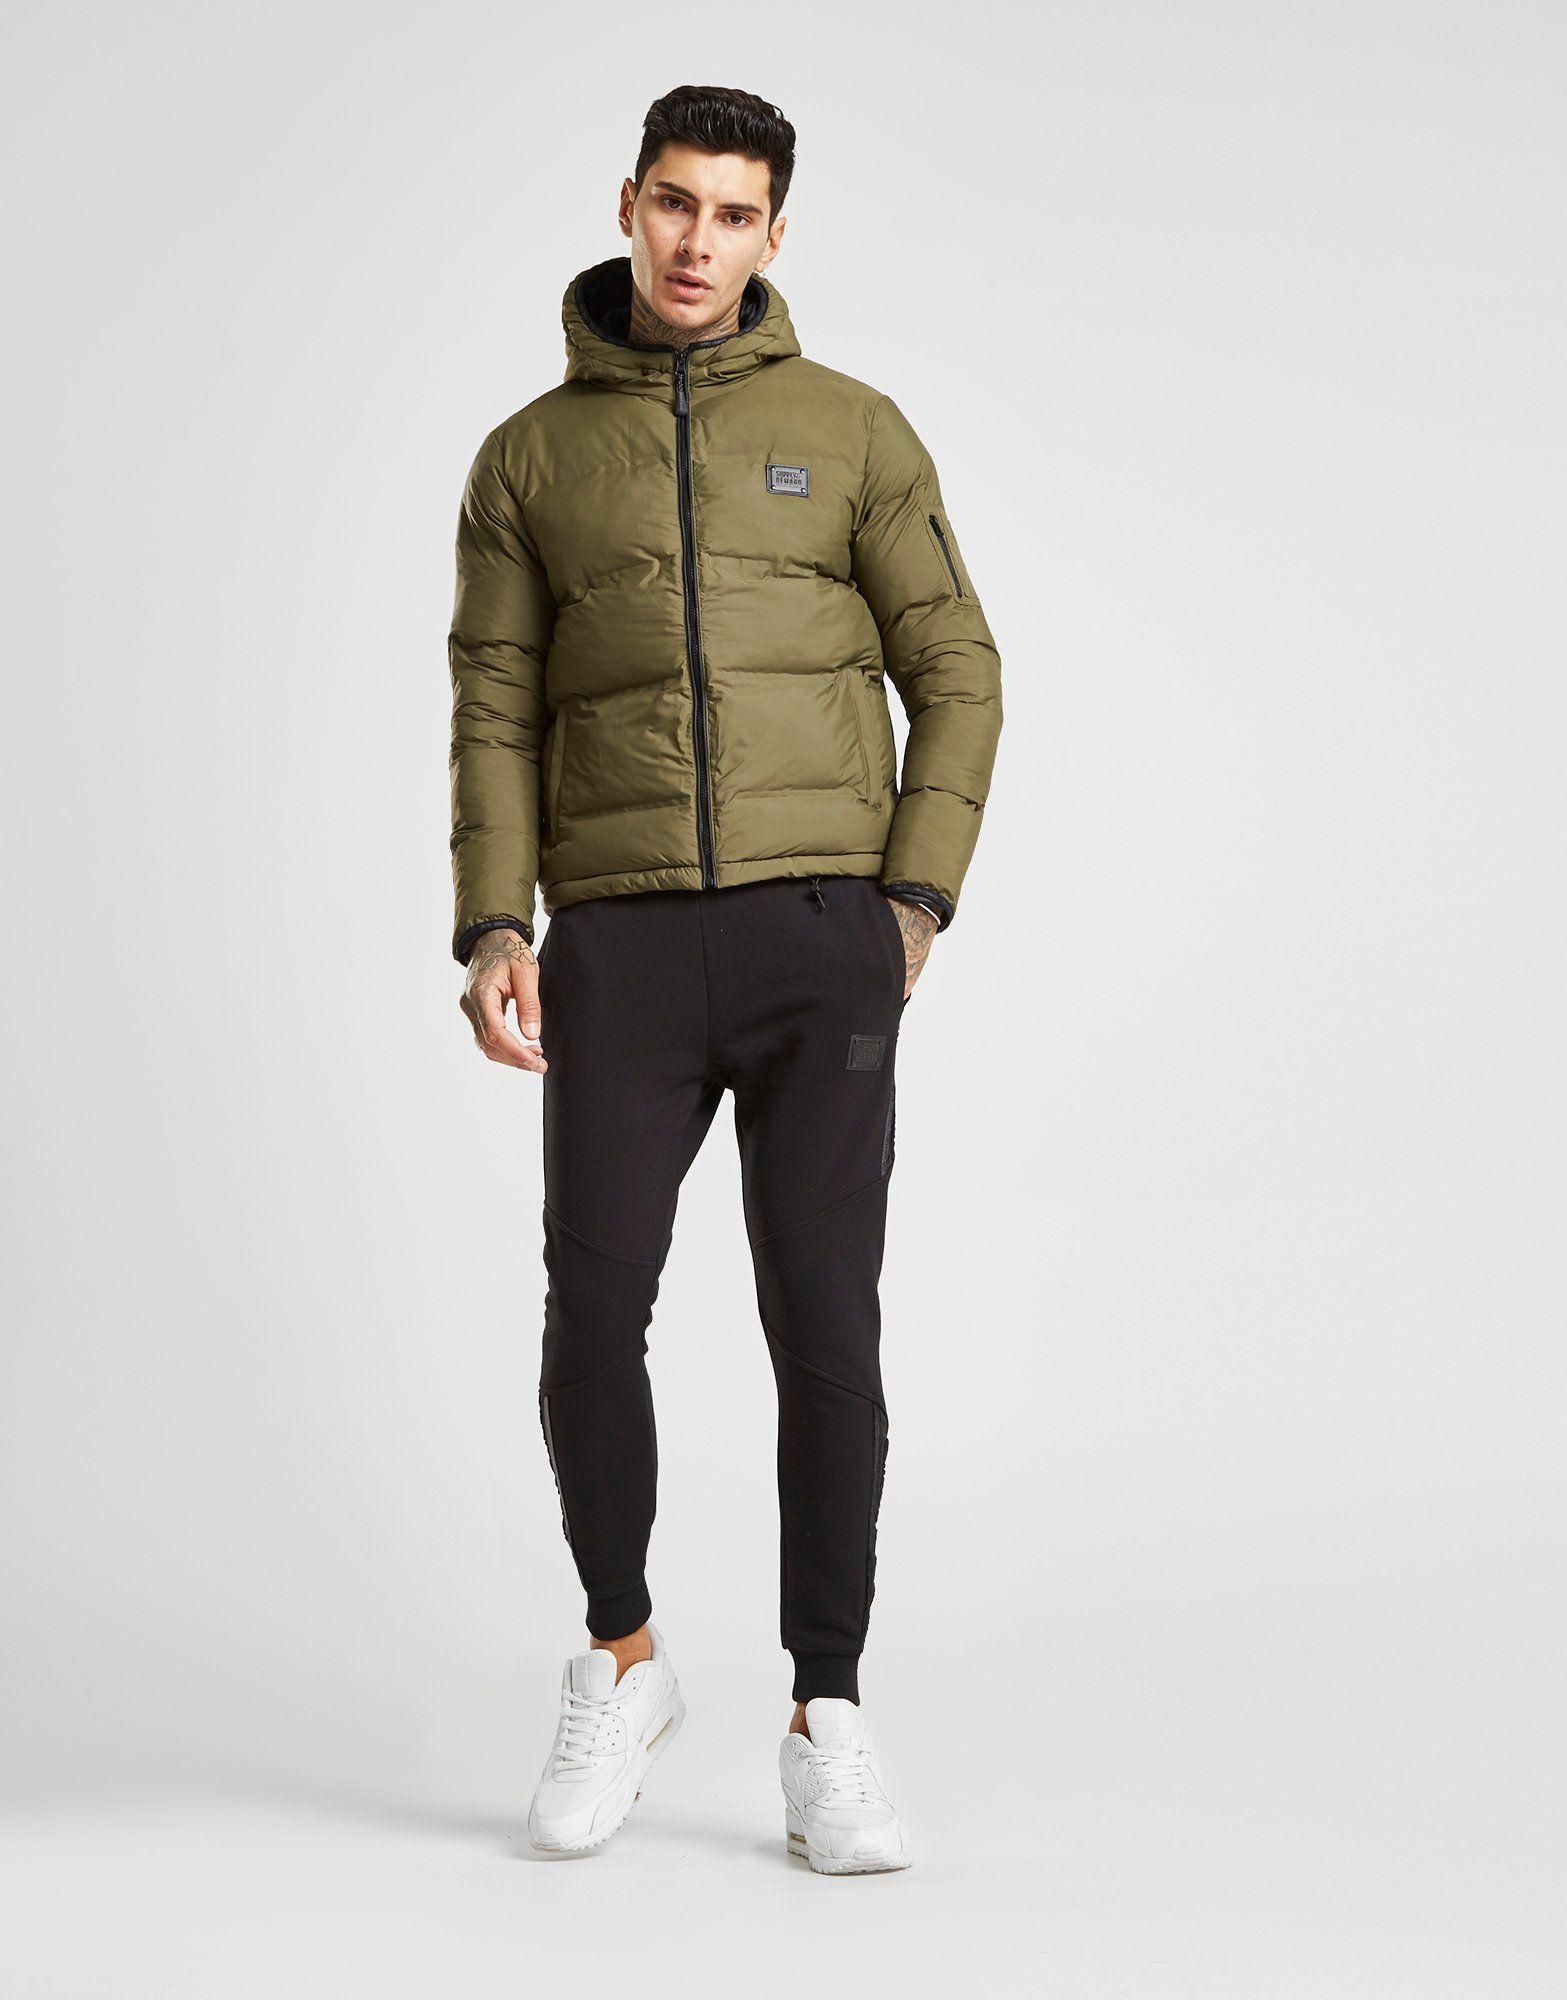 Supply & Demand Selector Jacket